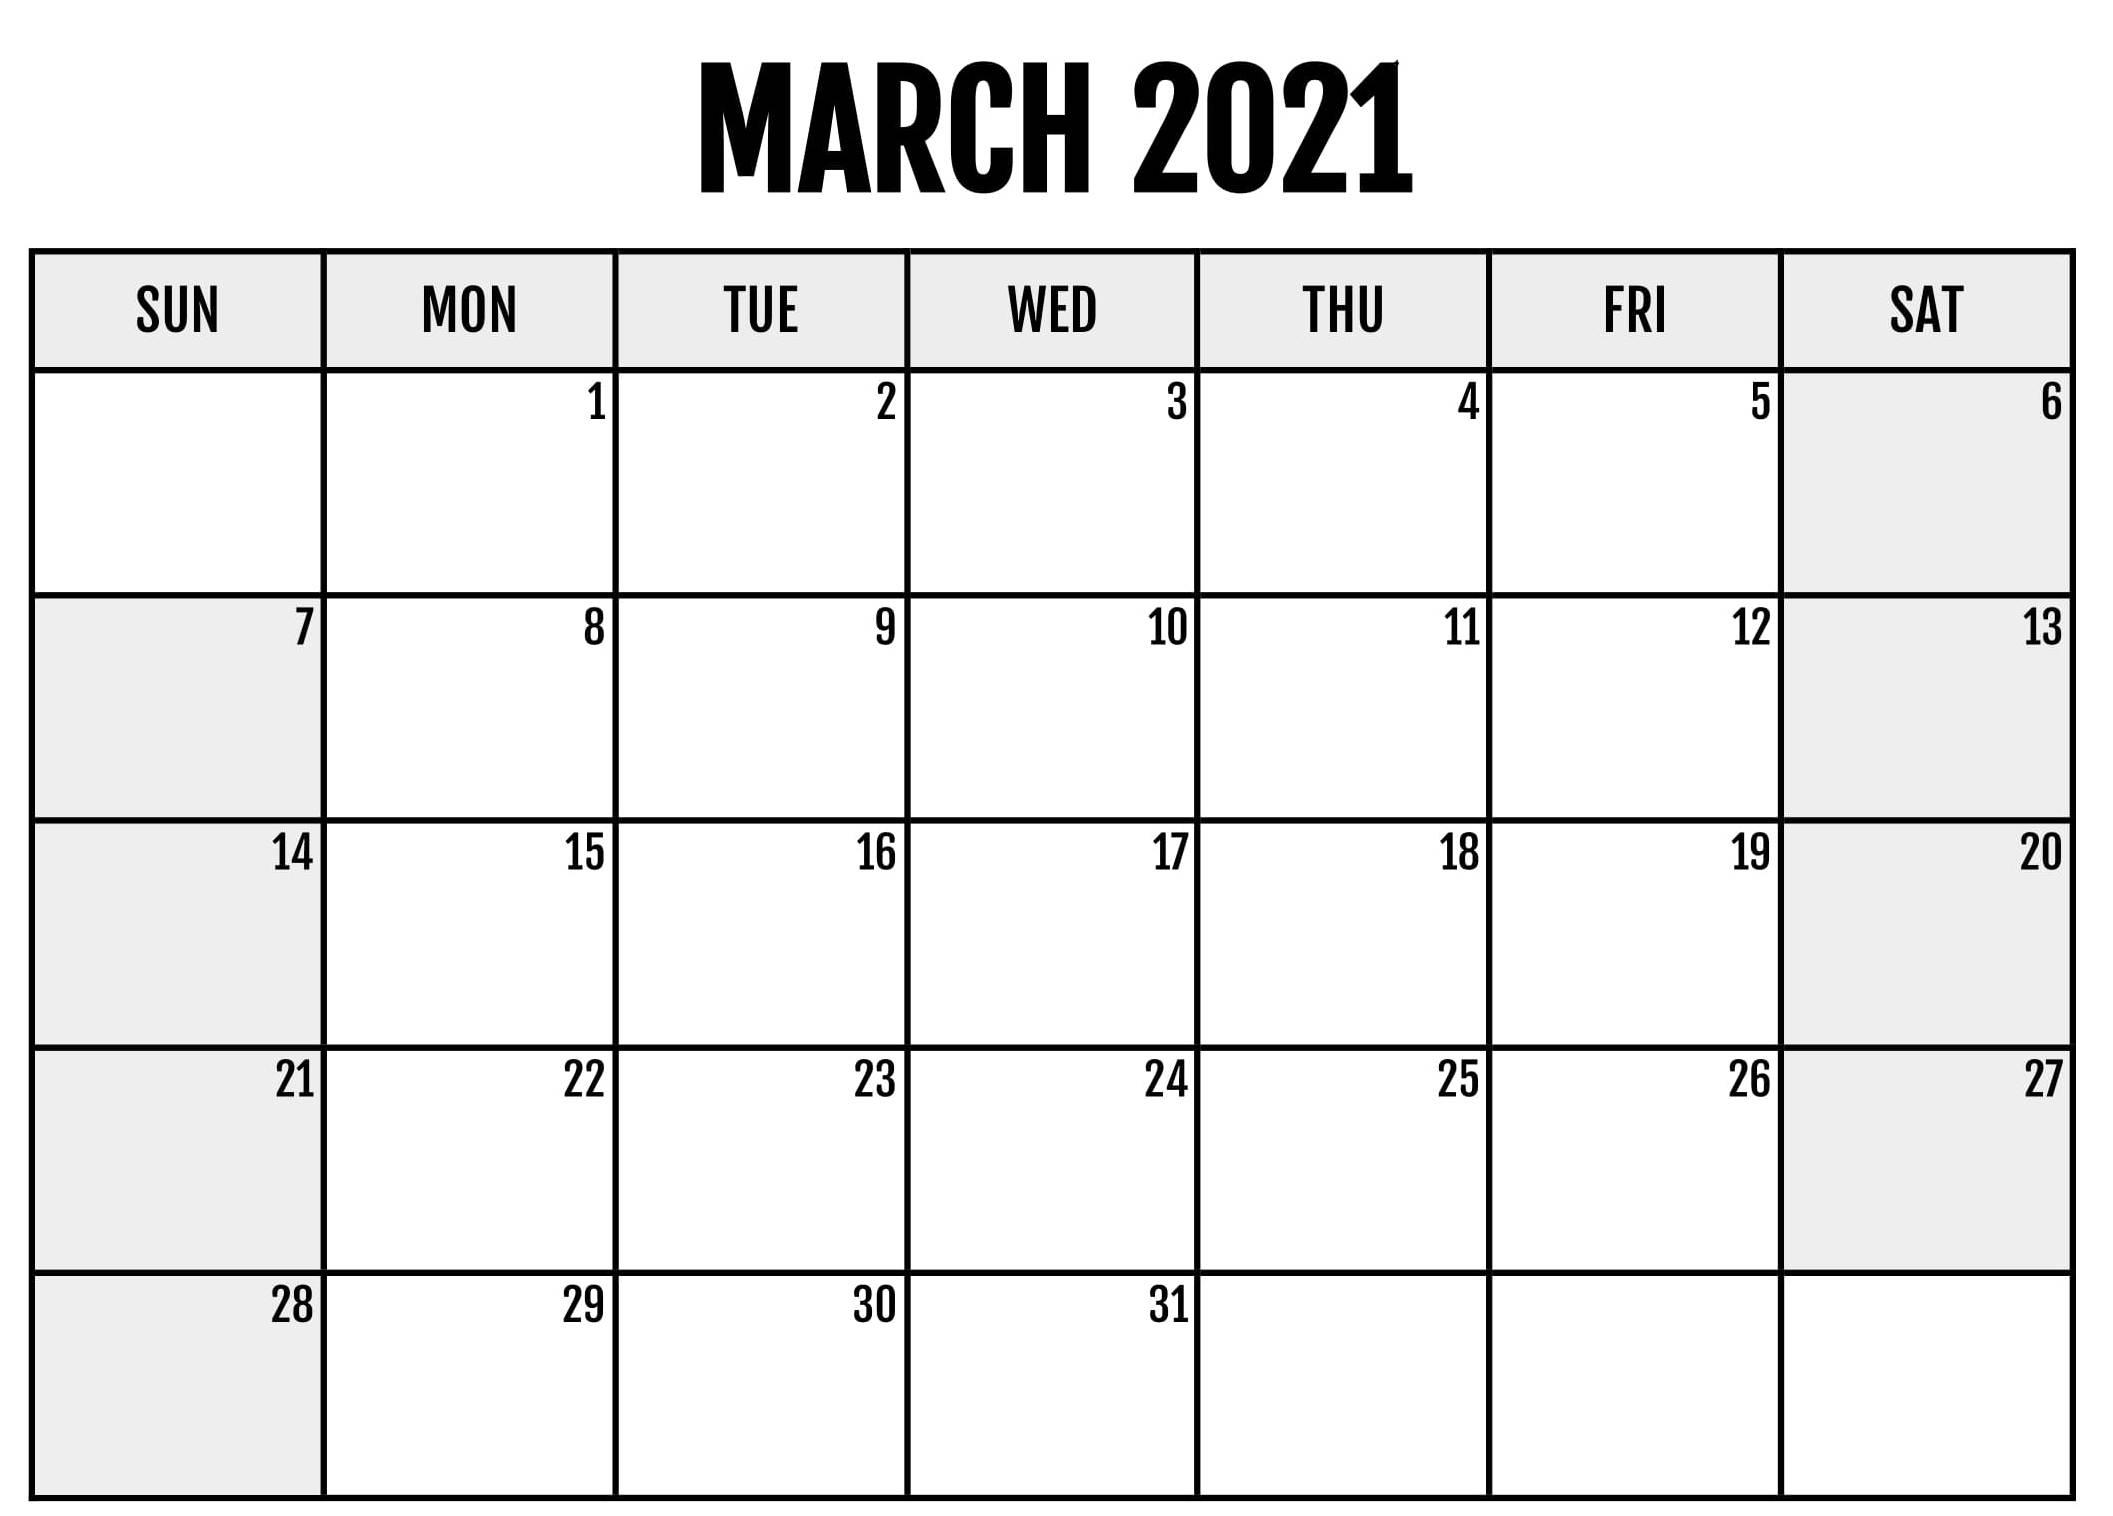 Online Calendar March 2021 Printable Holidays - Business inside March 2021 Calendar Template